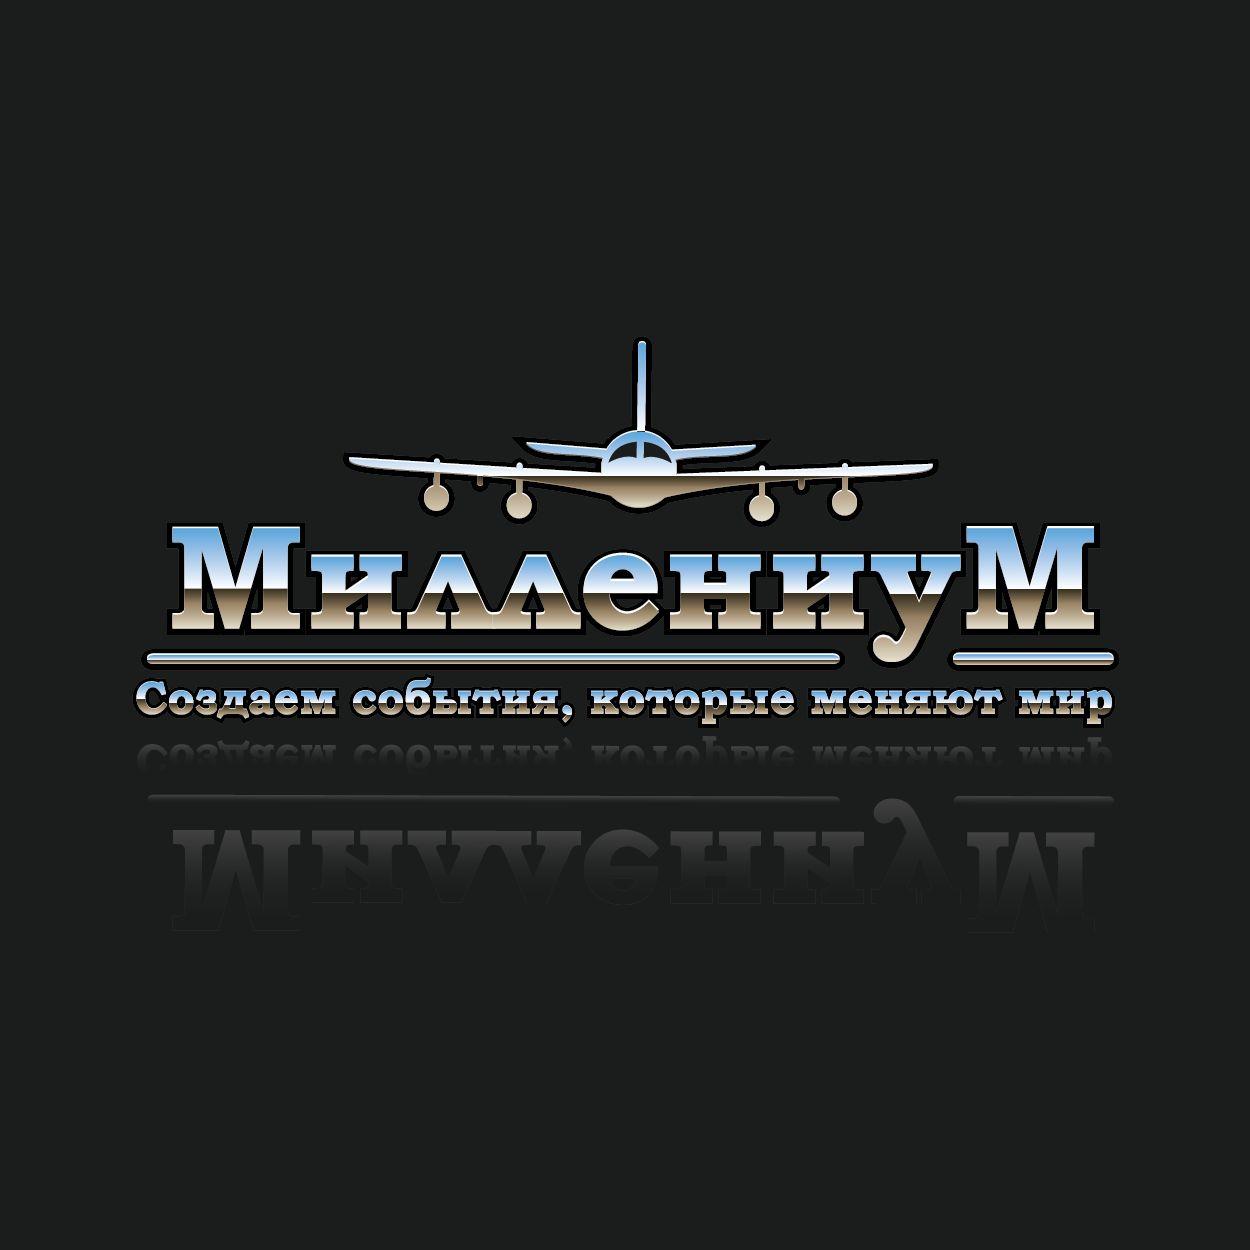 Бизнес Альянс Милленниум - дизайнер My1stWork